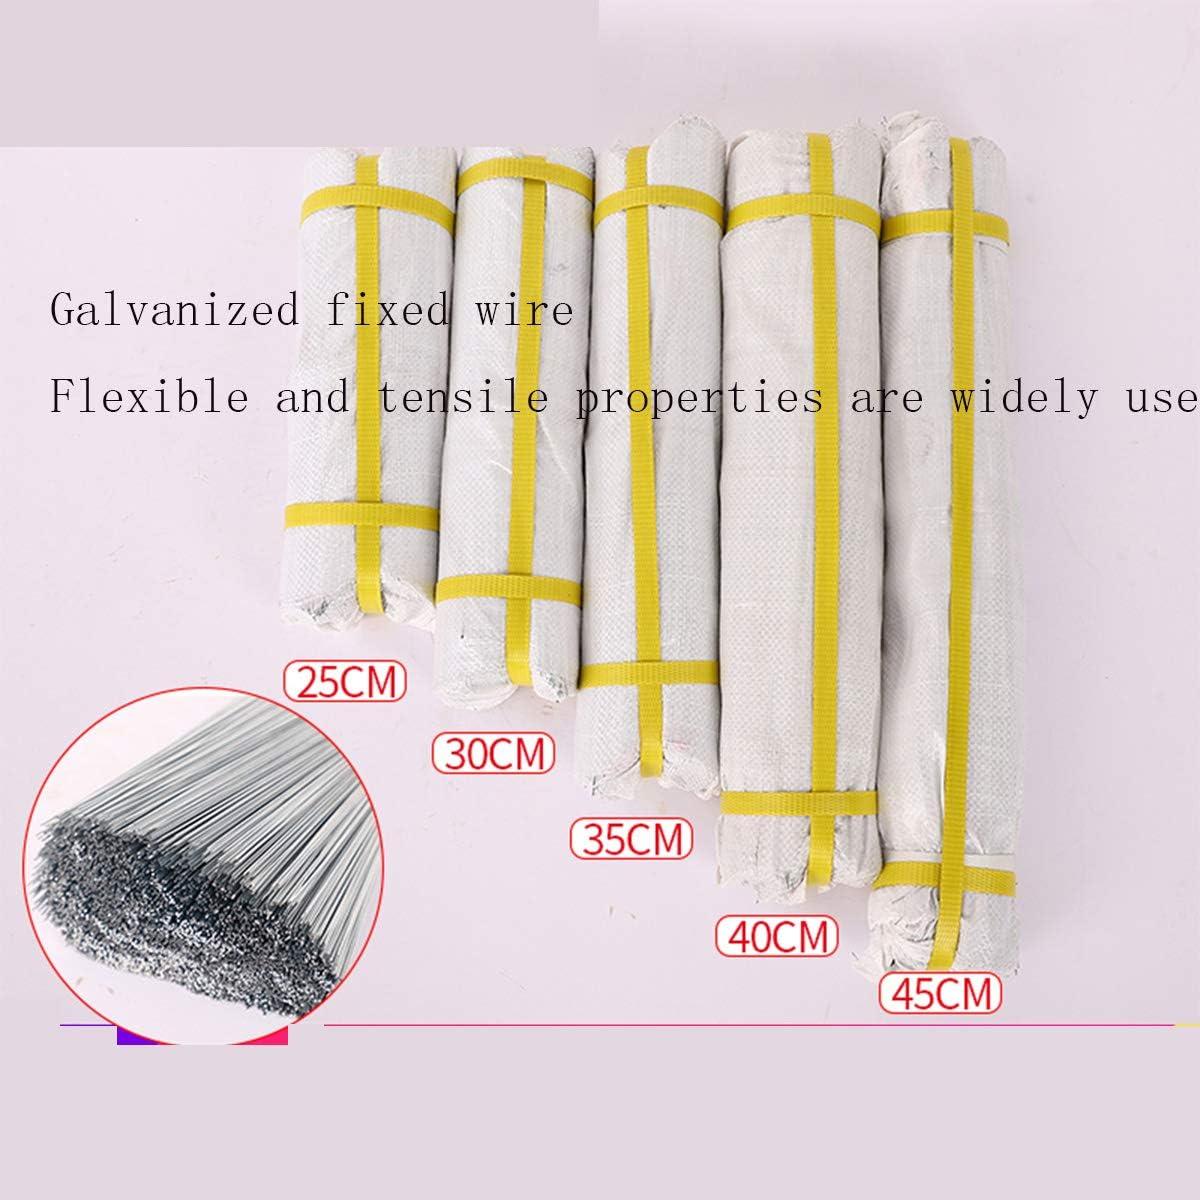 LOKIH Heavy Duty Garden Wire Galvanised Wire Metal Fencing Wire Outdoor Size:25cm//30cm//35cm//40cm,35cm